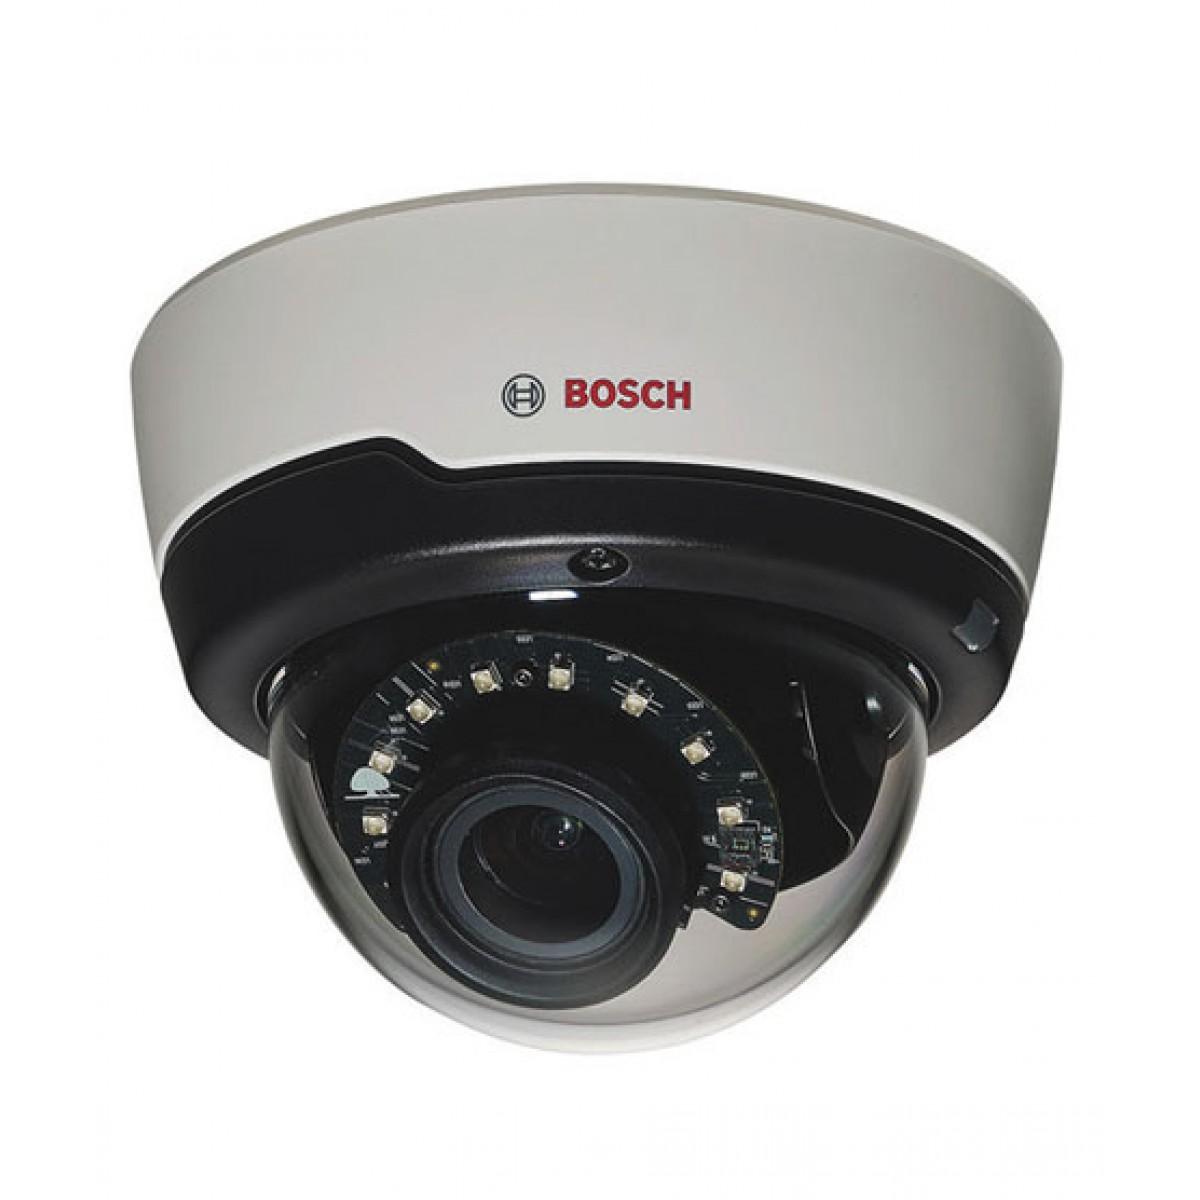 Bosch FLEXIDOME IP Indoor 4000 HD Camera